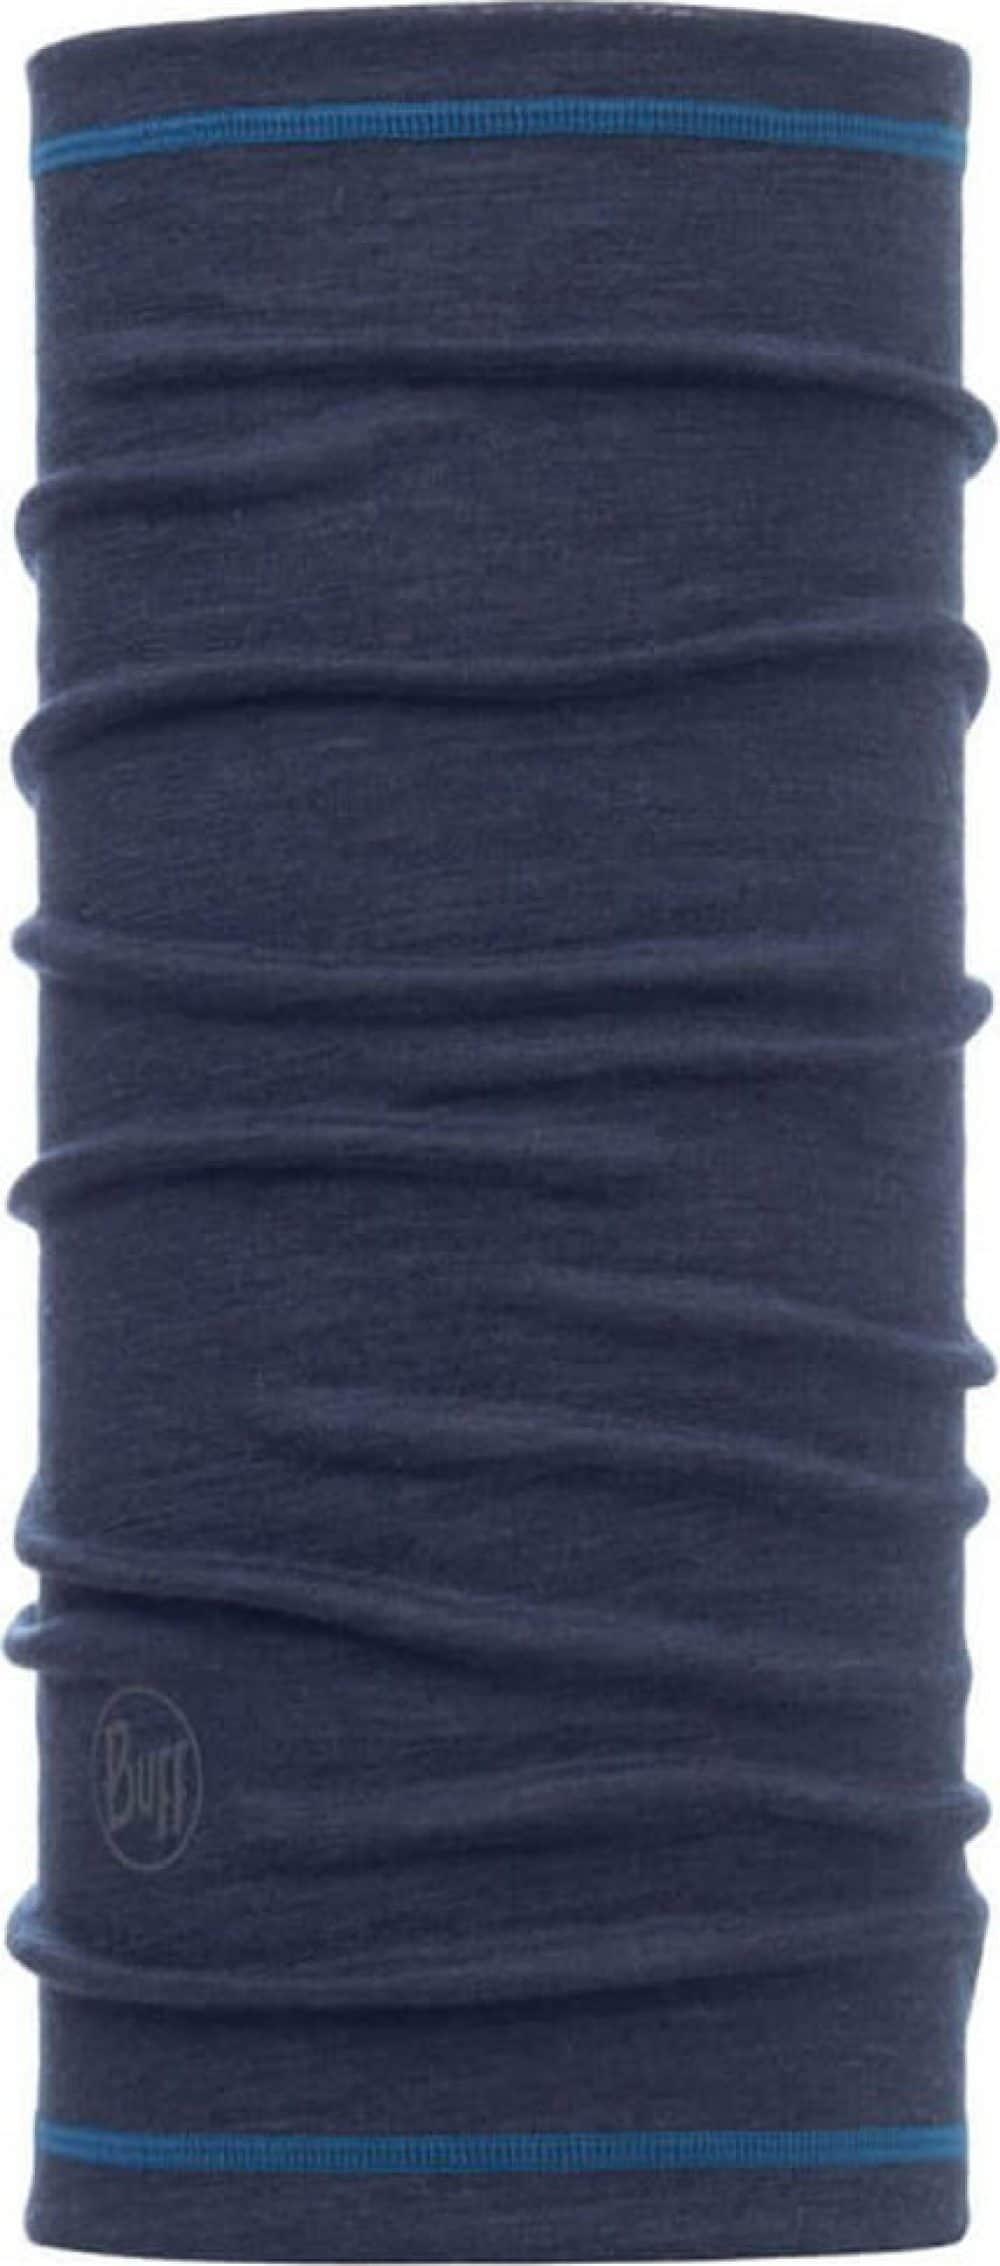 "Studio photo of the 3/4 Wool Buff® Design ""Denim"". Source: buff.eu"